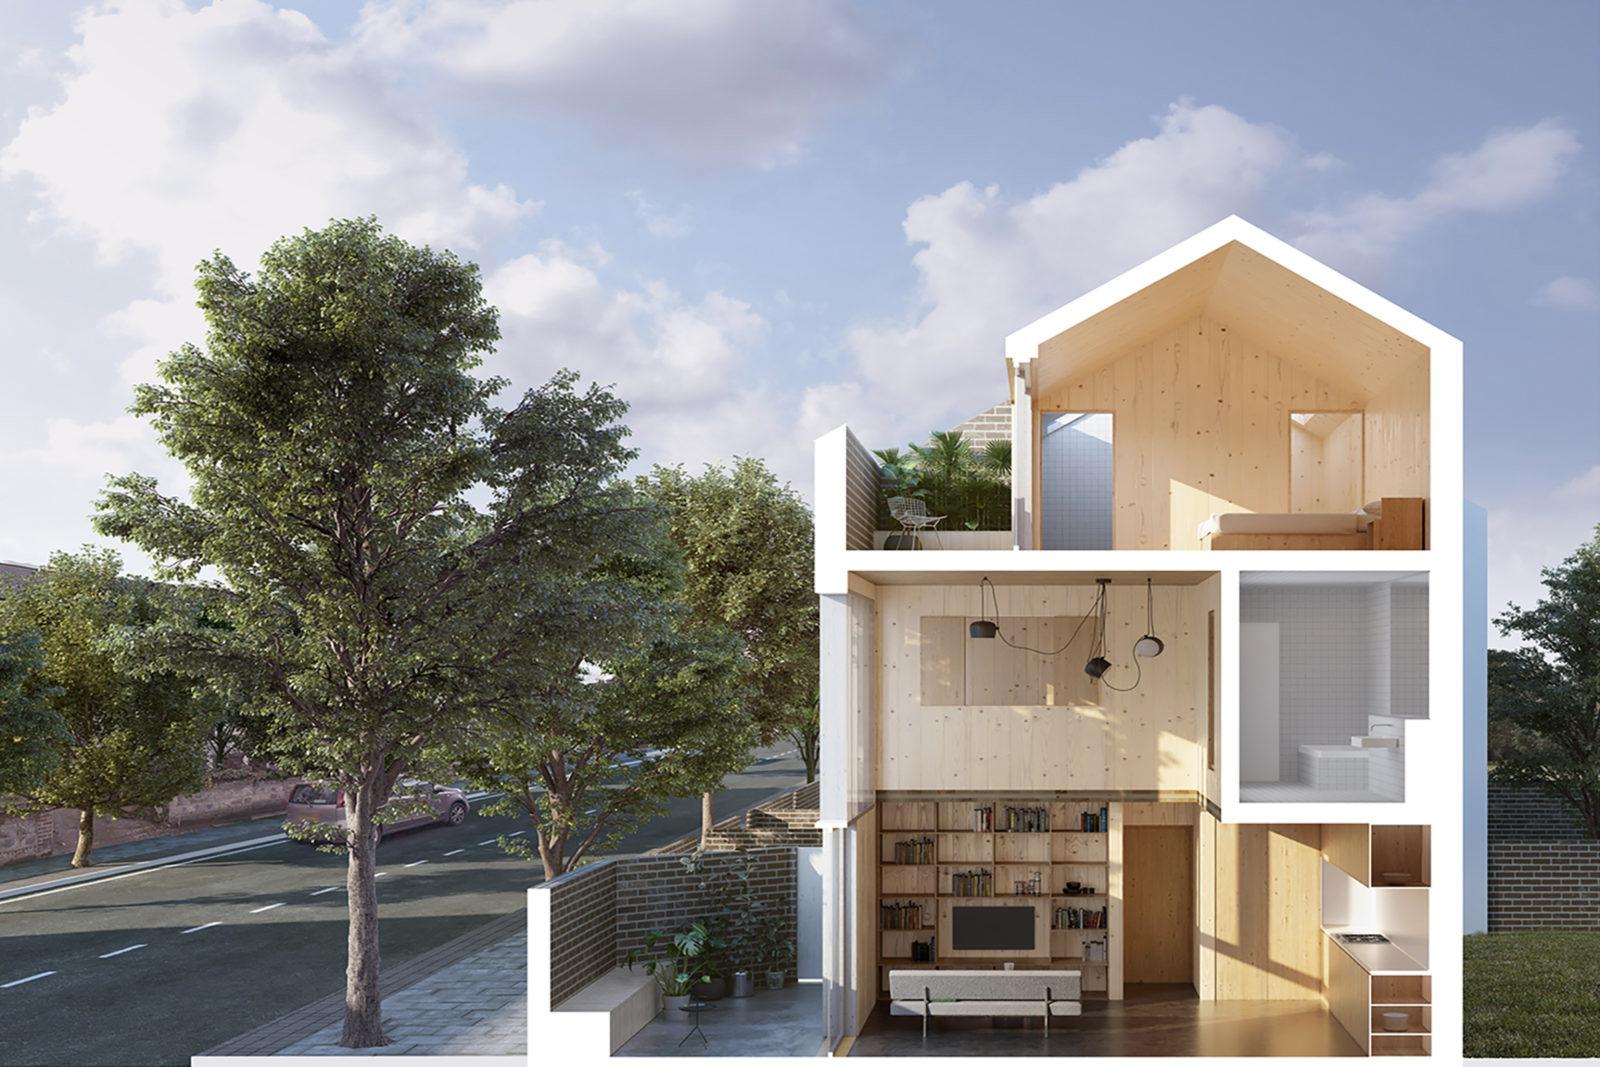 Carl Turner designed Cube Haus